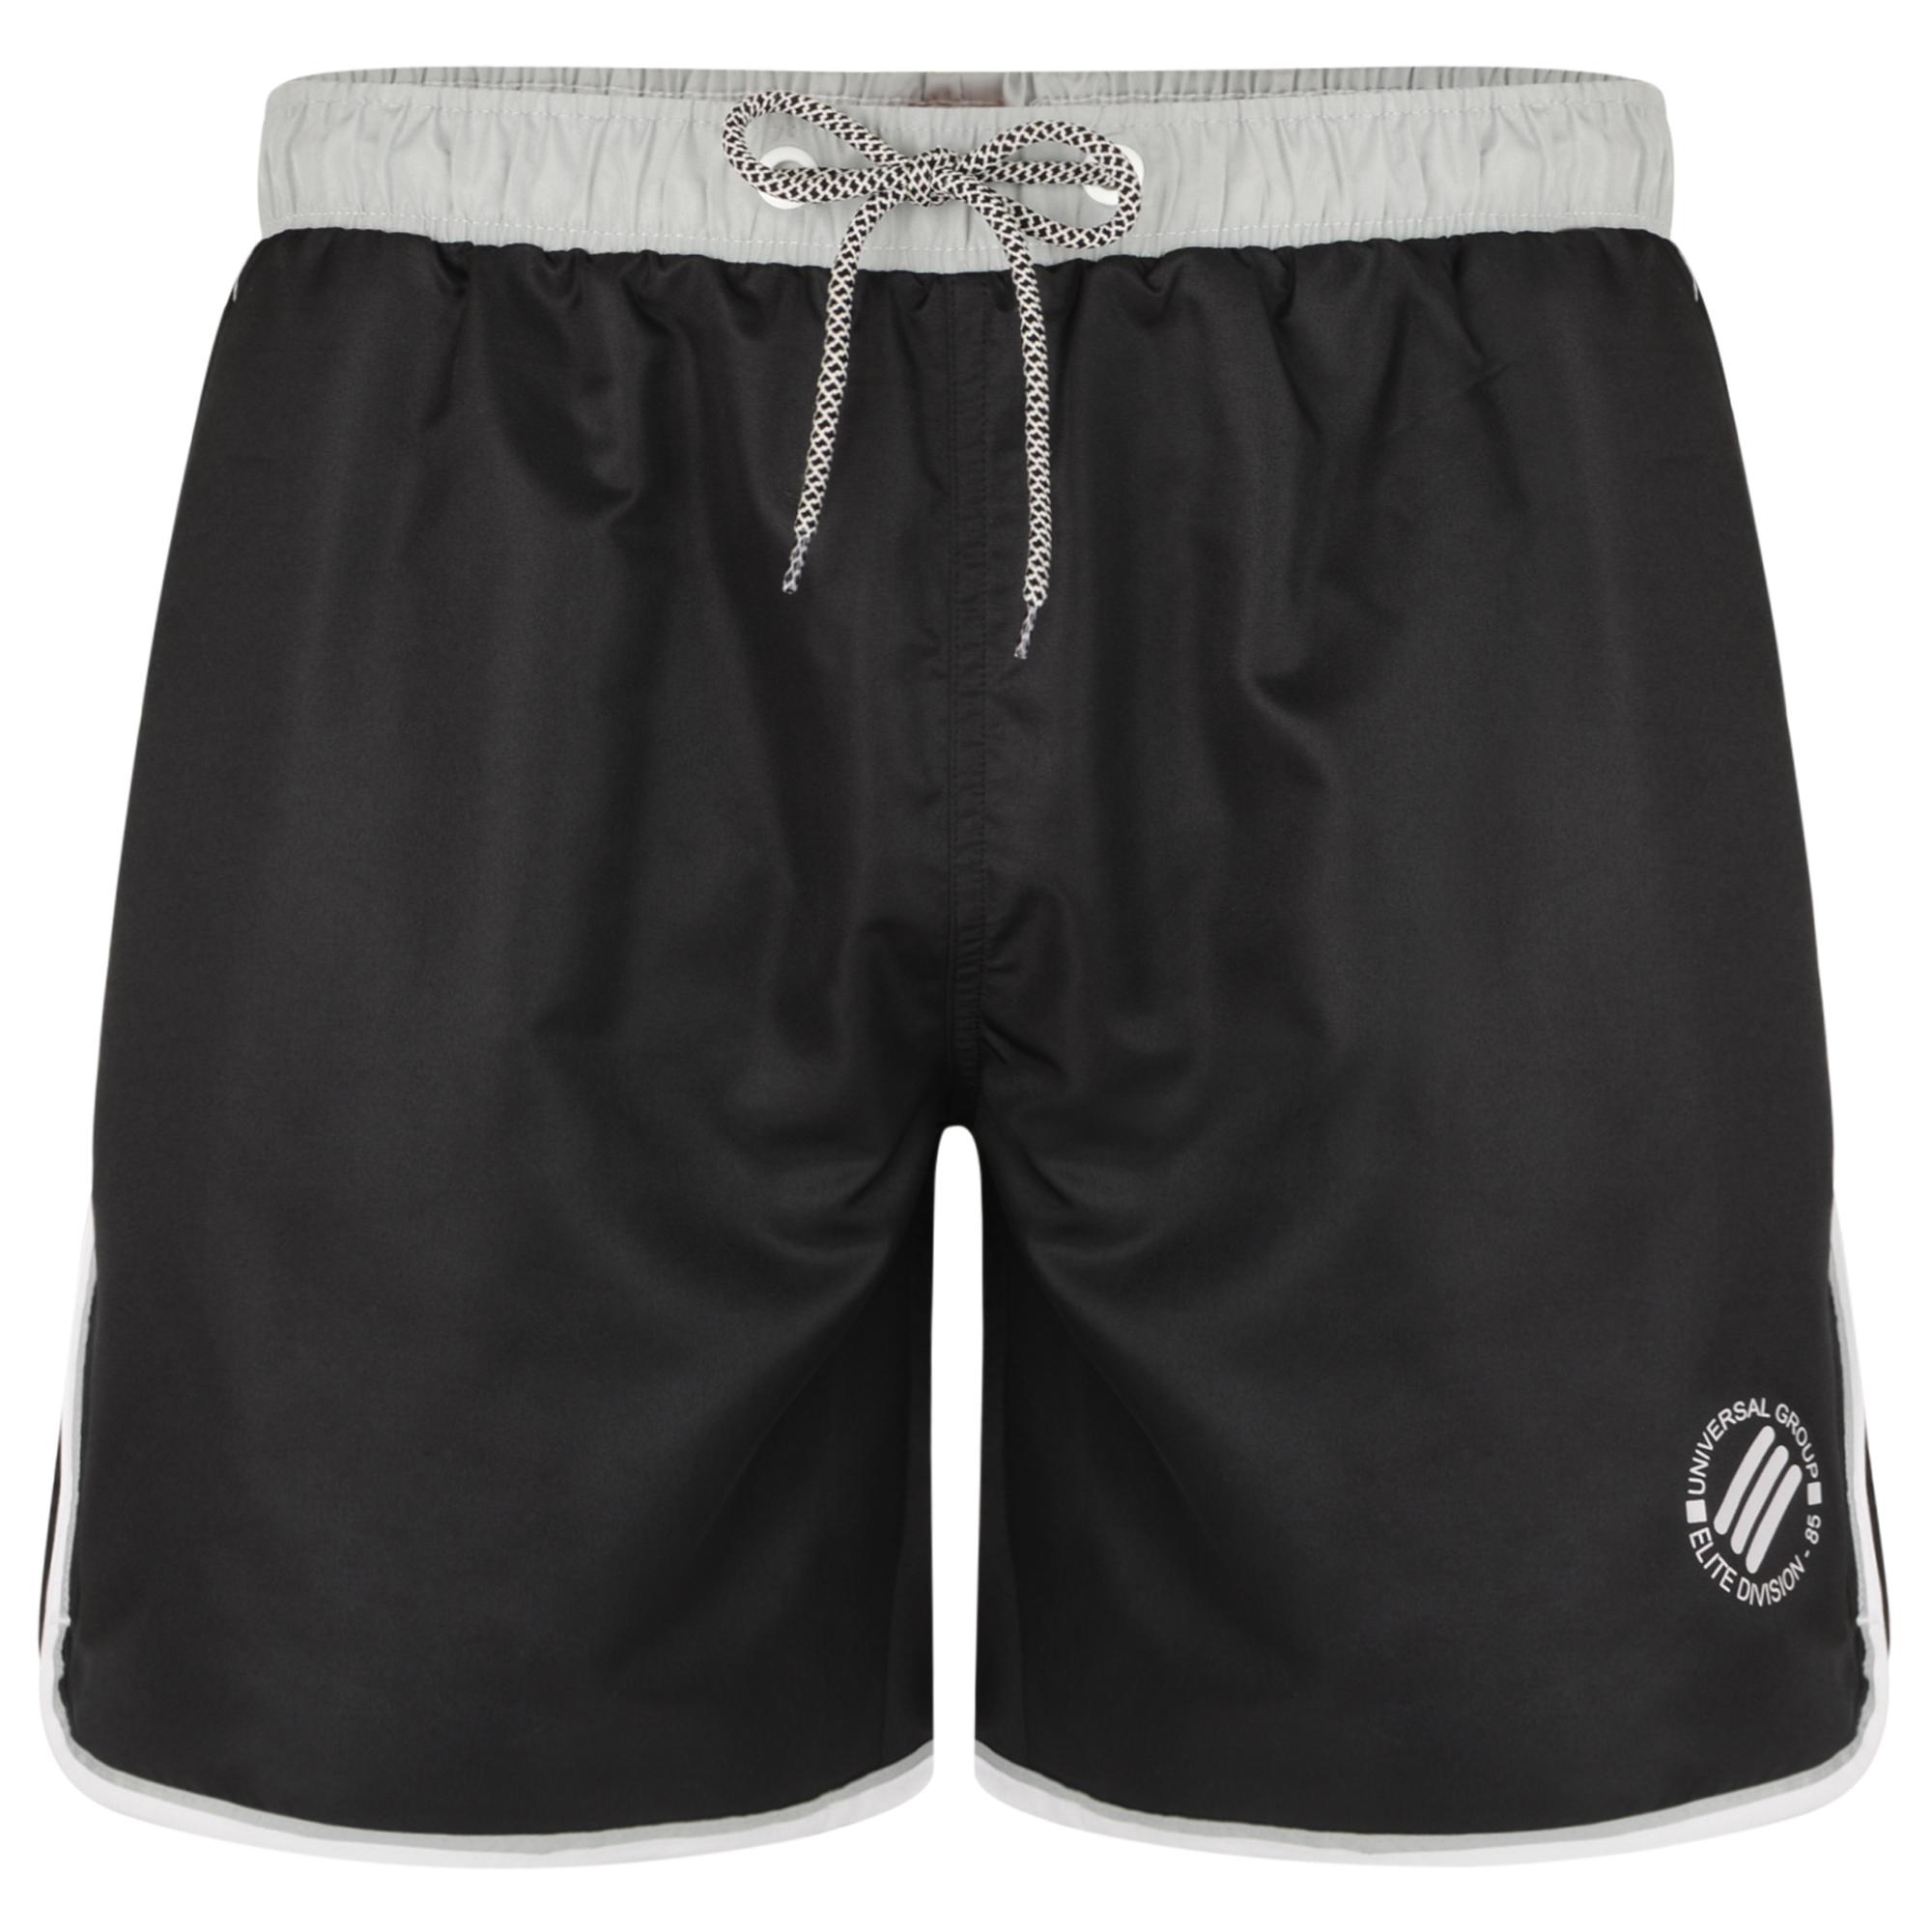 Swim Shorts Twinstripe van merk KAM Jeanswear in de kleur zwart, gemaakt van polyester. Met binnenbroekje, elastiek in de band en trekkoord, side piping en logo op de pijp.